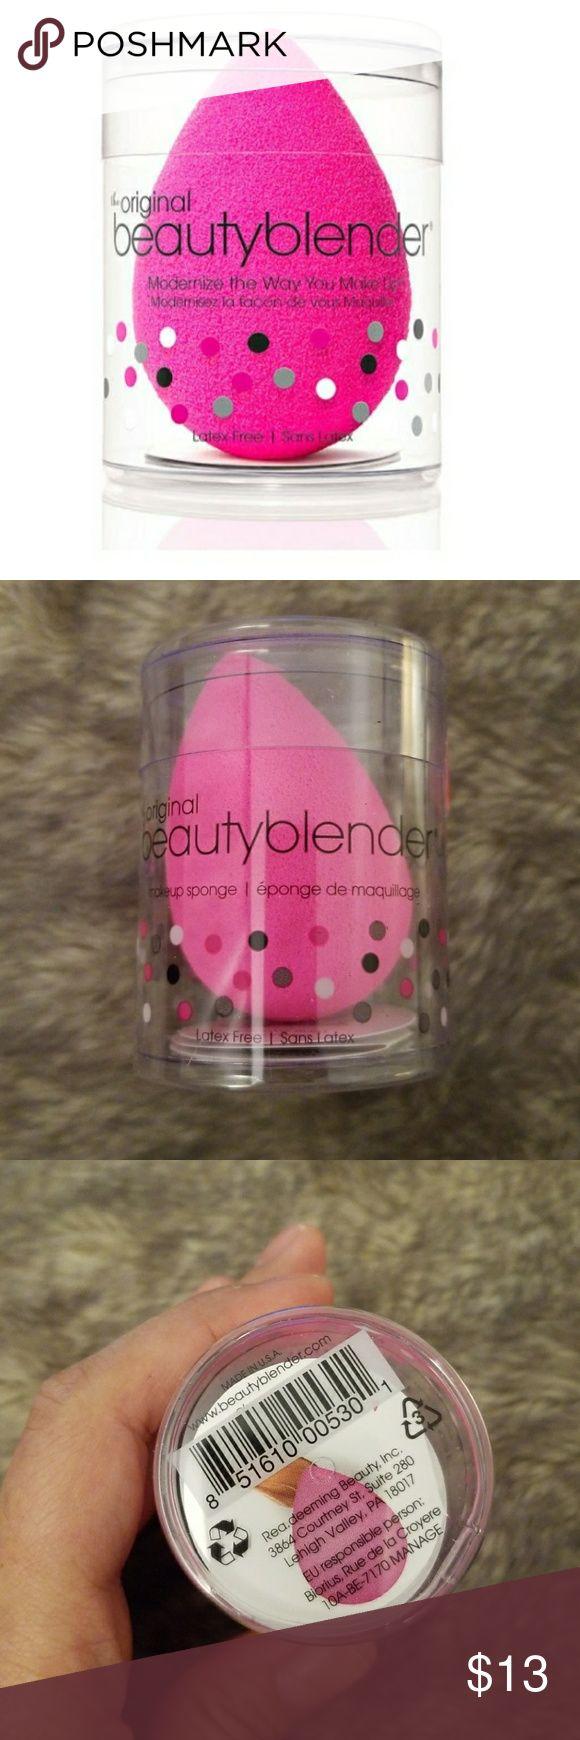 Original Beauty Blender New. Authentic. Original packaging Beauty Blender Makeup Brushes & Tools